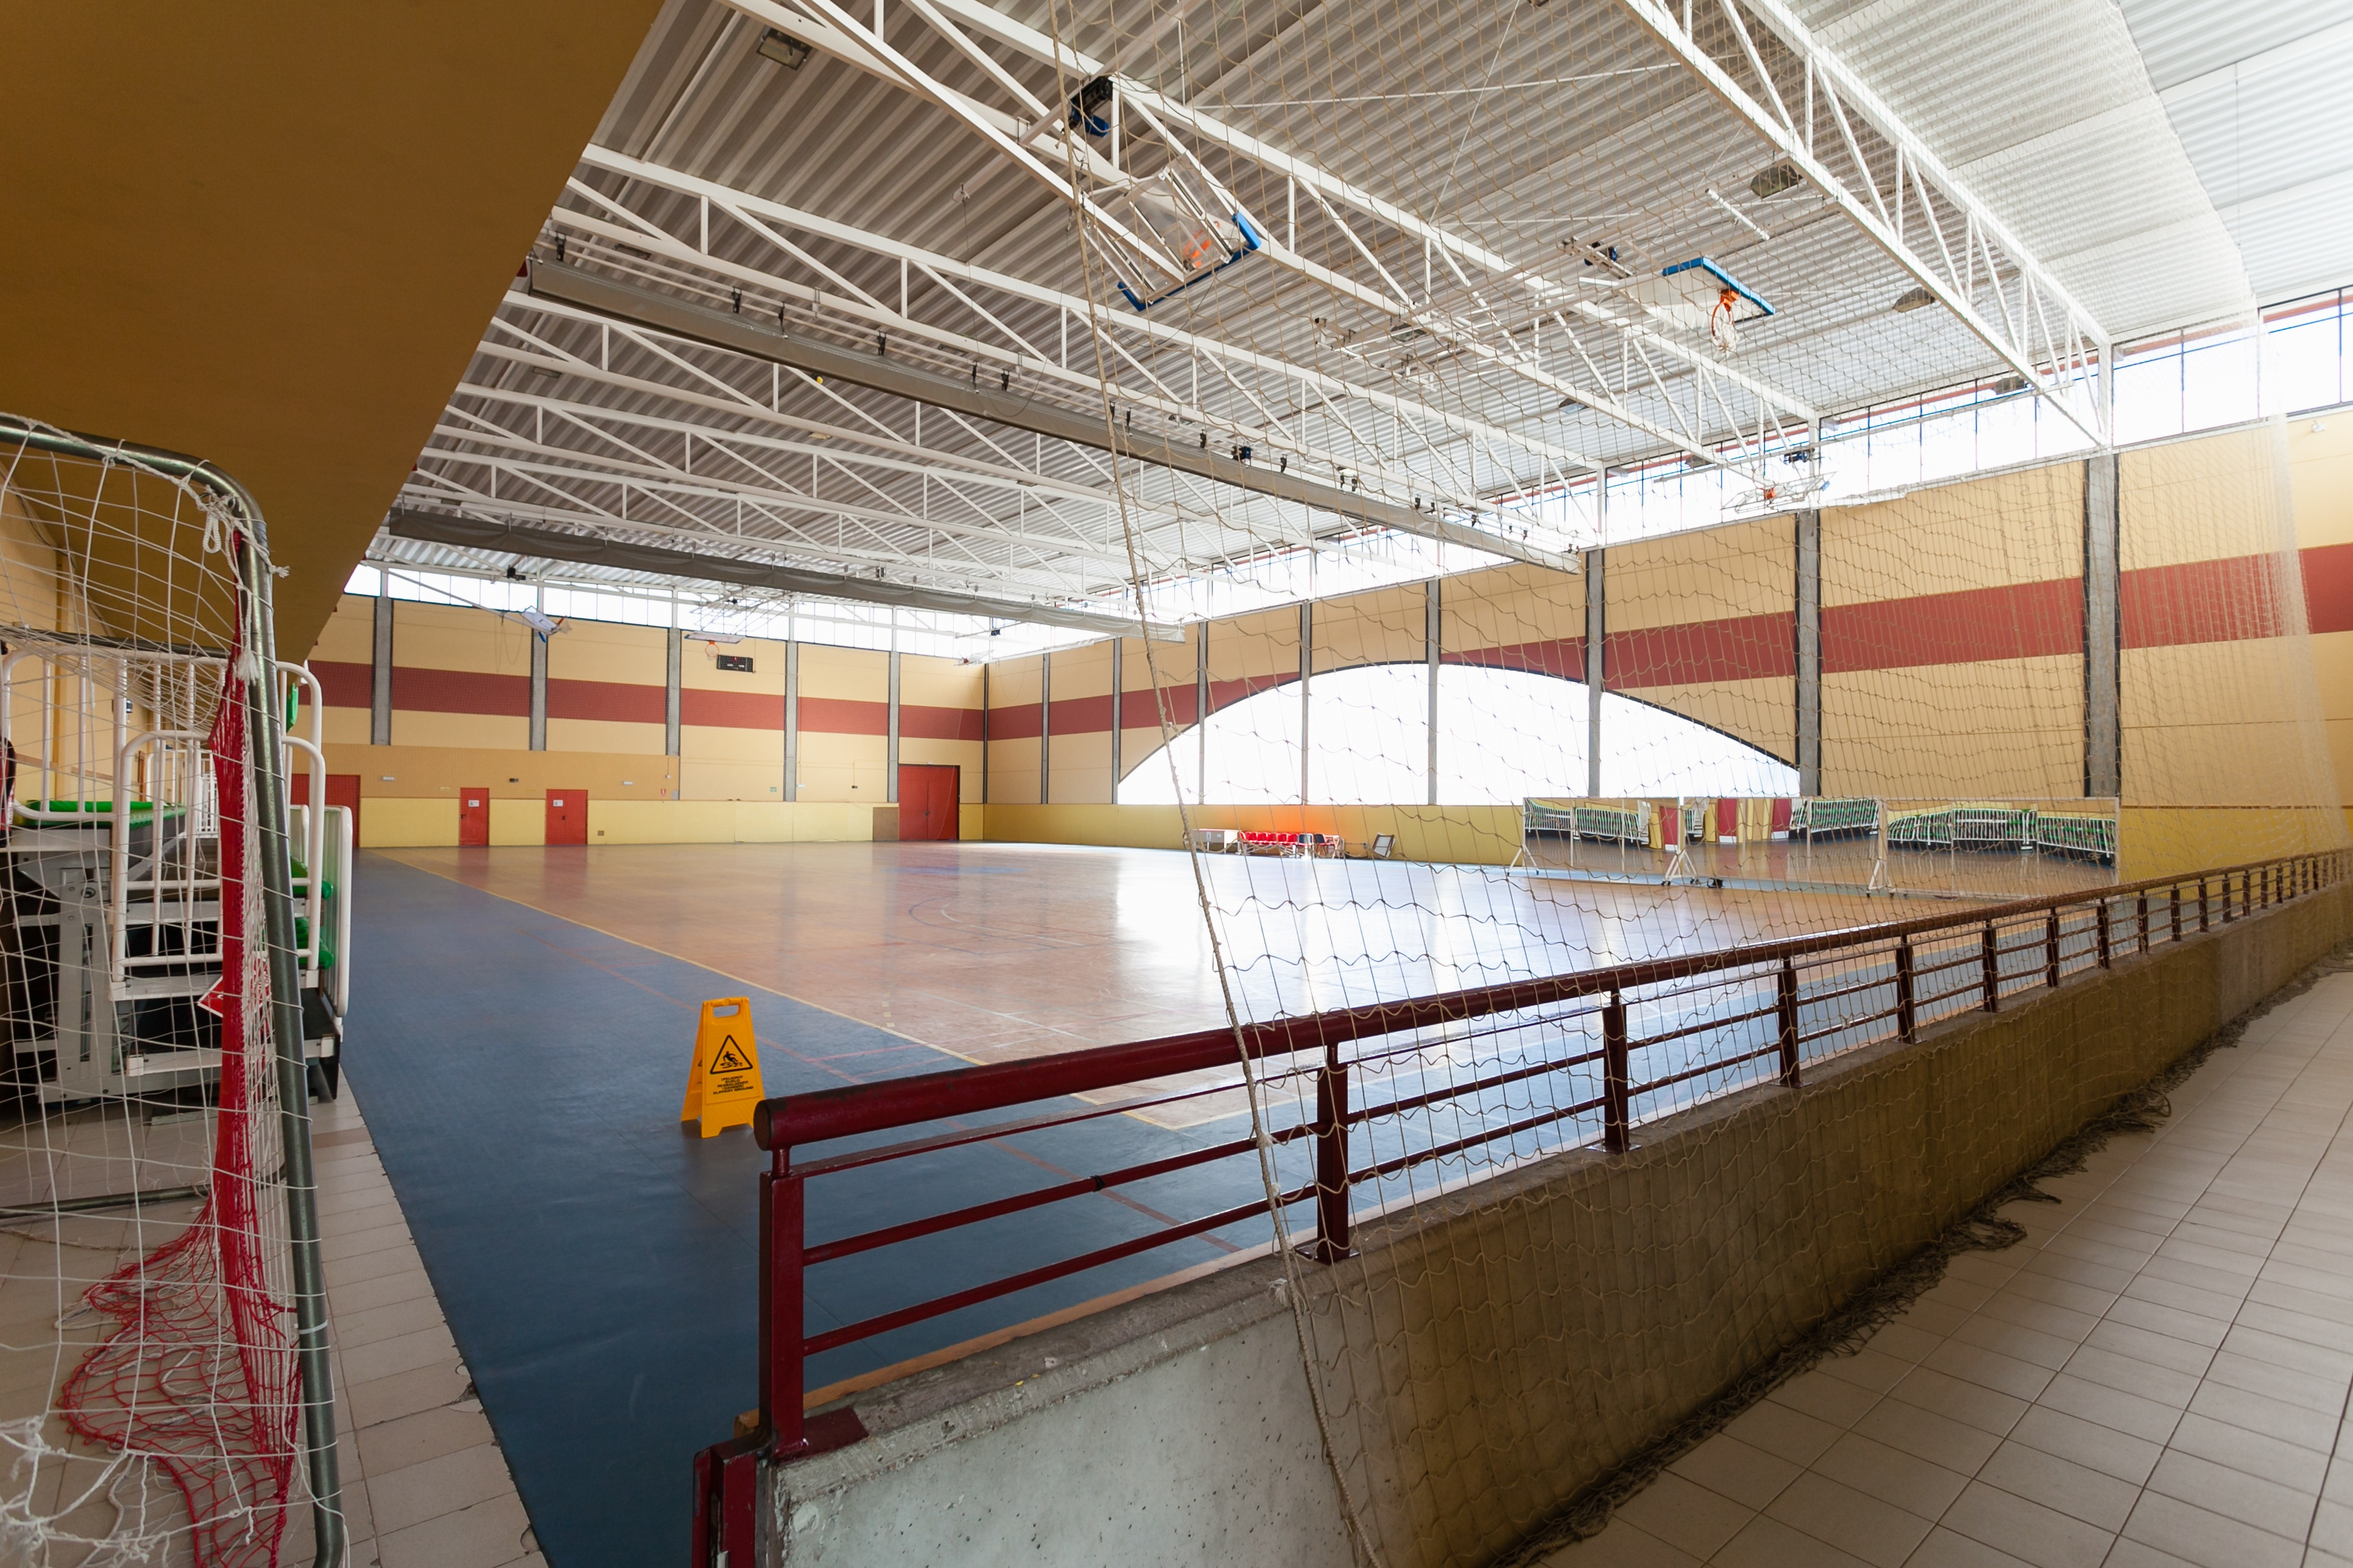 Pabellón polideportivo Rafael Lozano 1